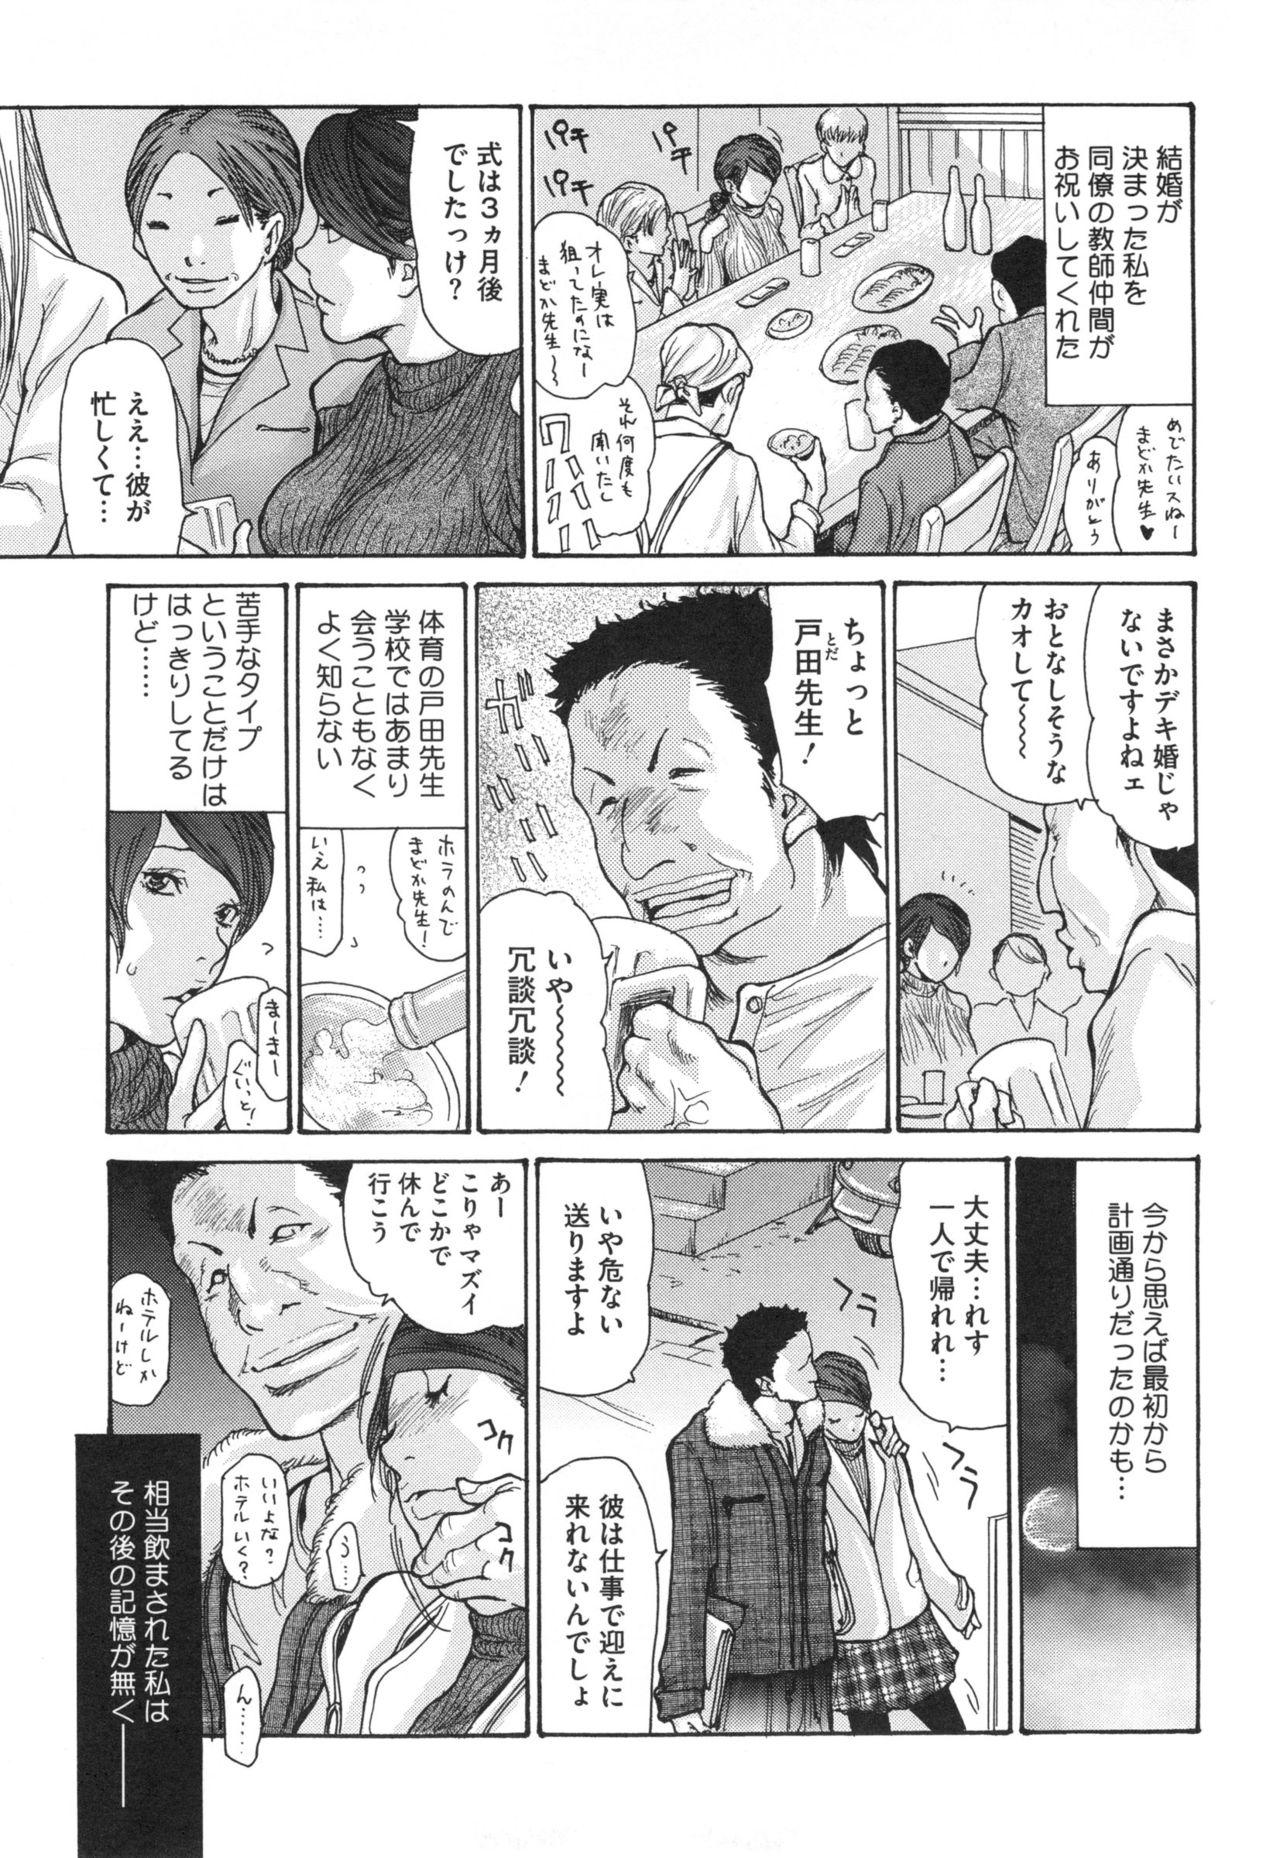 Niku-zuma Netorare Maniacs 51